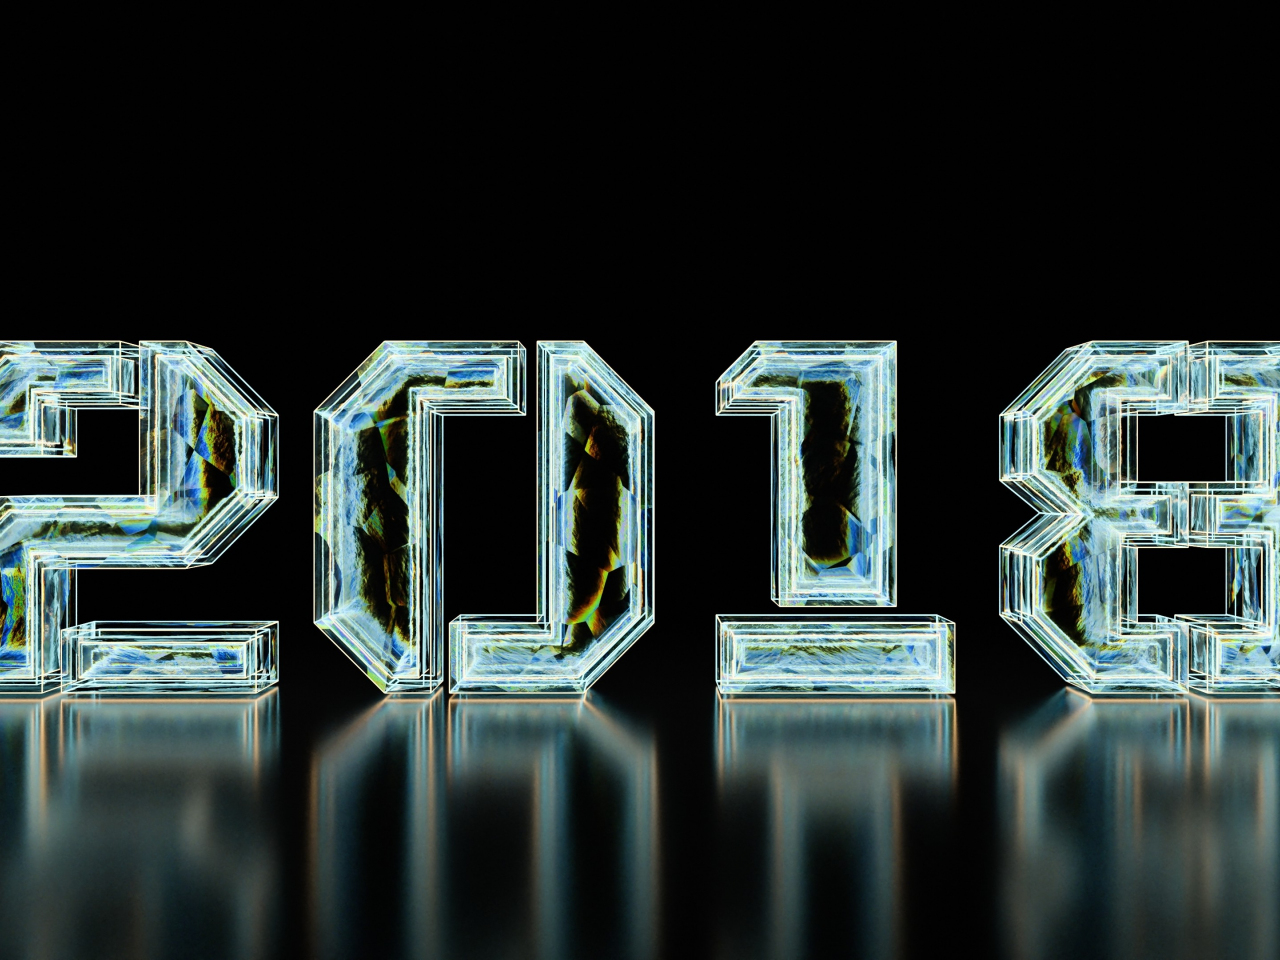 1280x960 wallpaper New year, 2018, typography, digital art